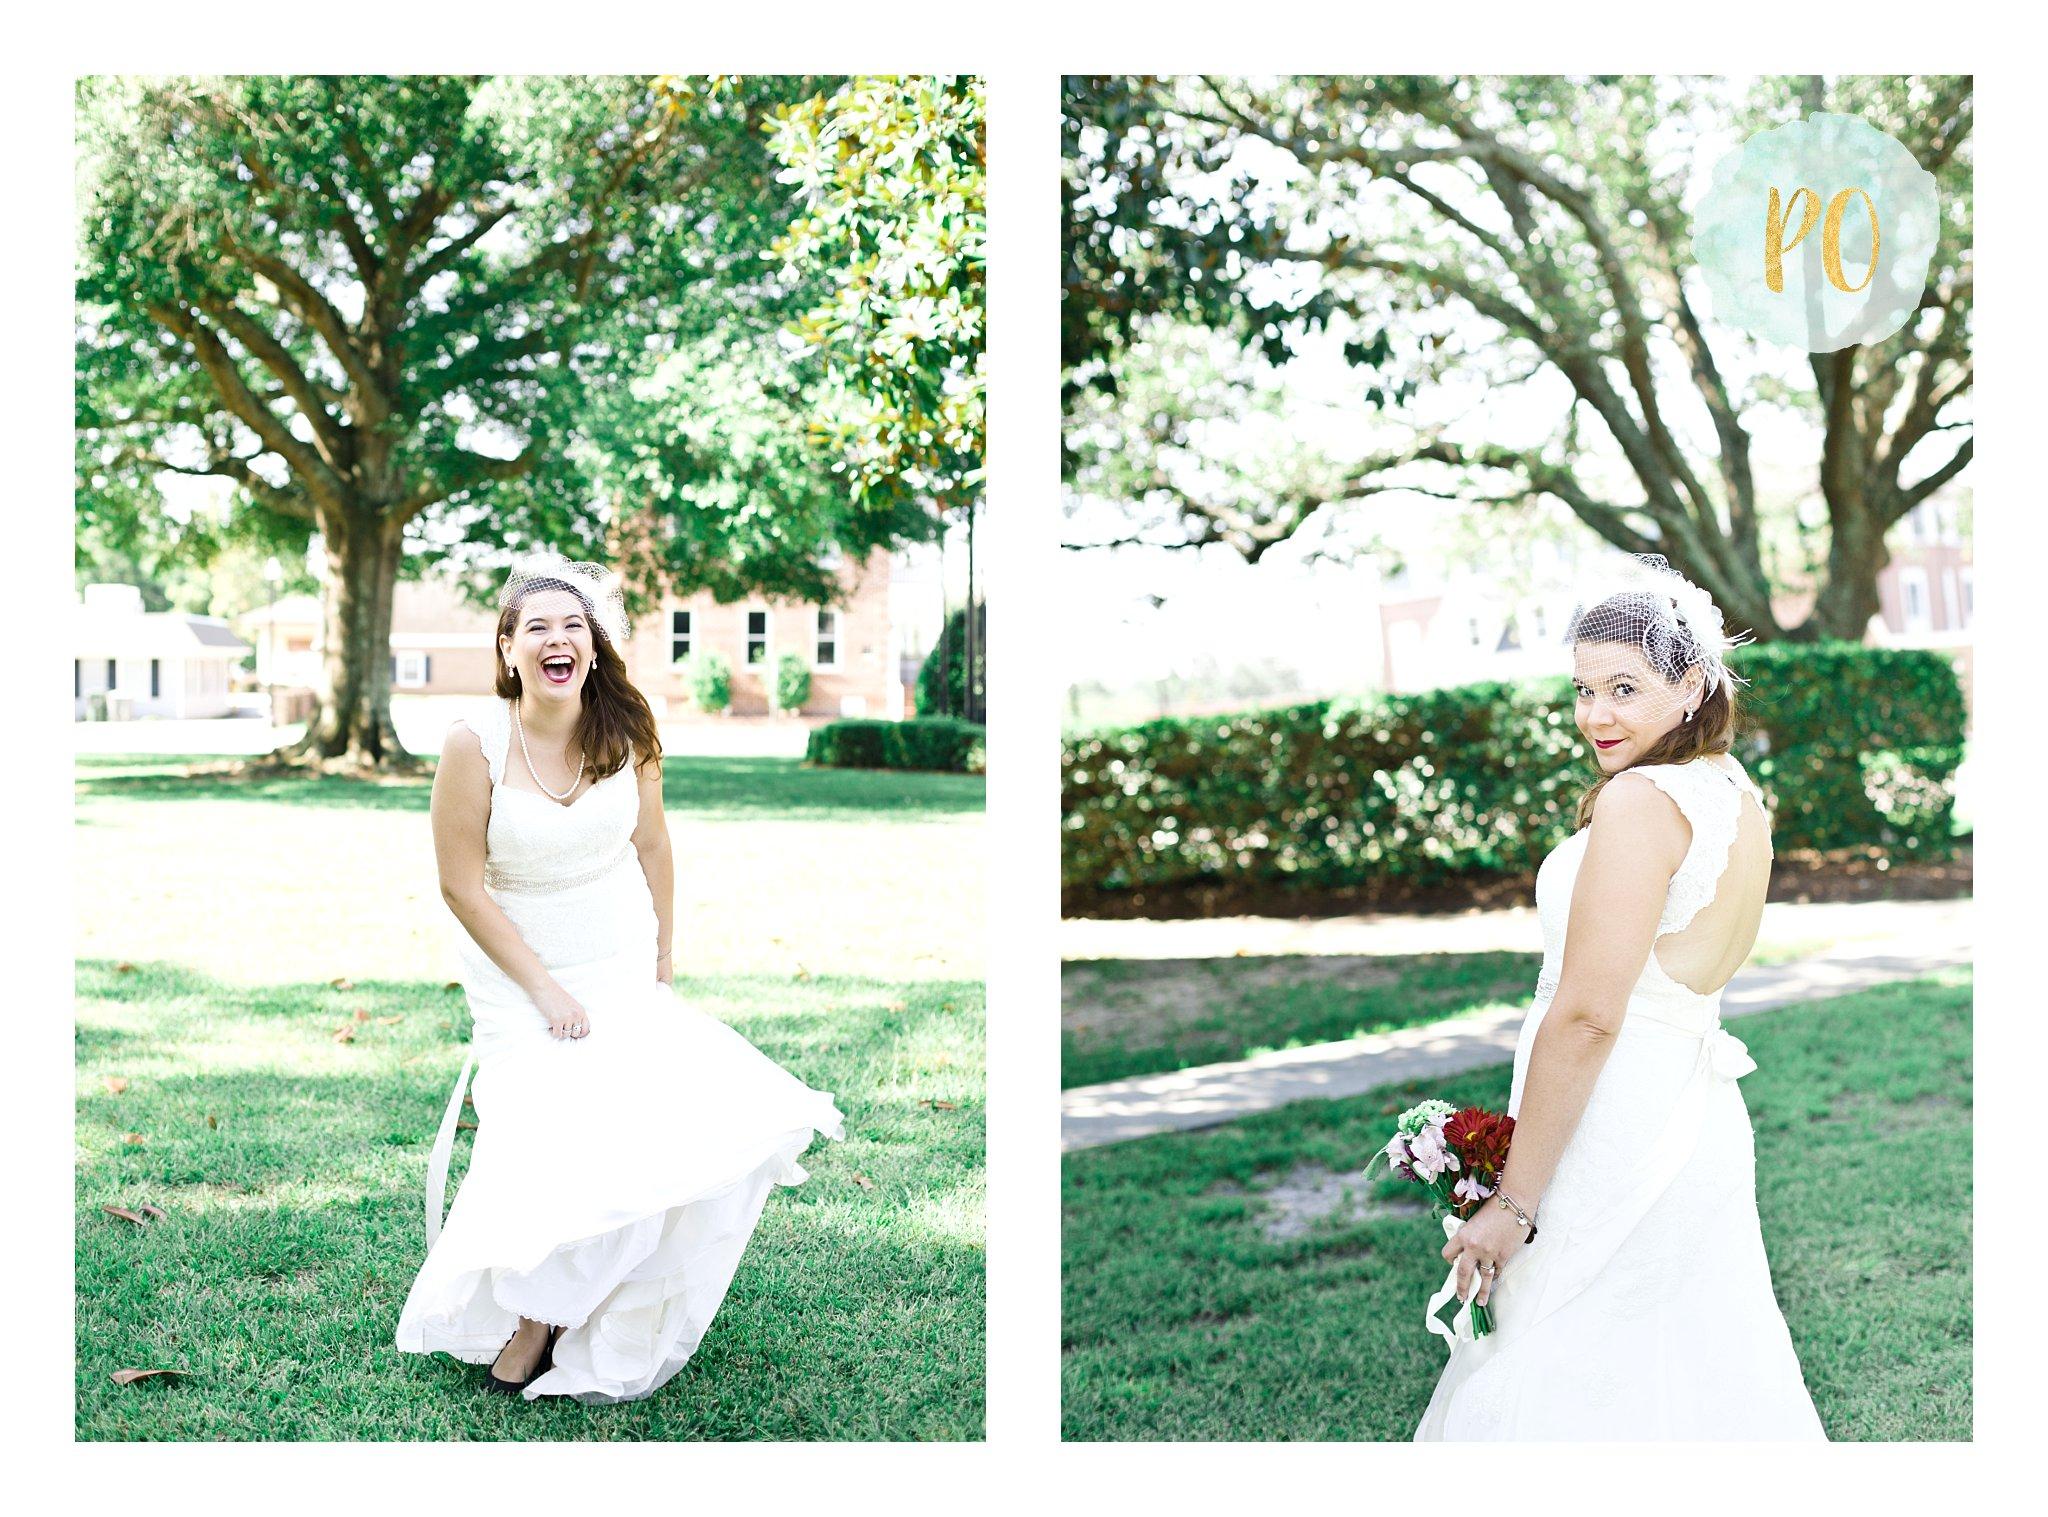 cypress-inn-lowcountry-bridal-session-conway-sc-photos_0147.jpg